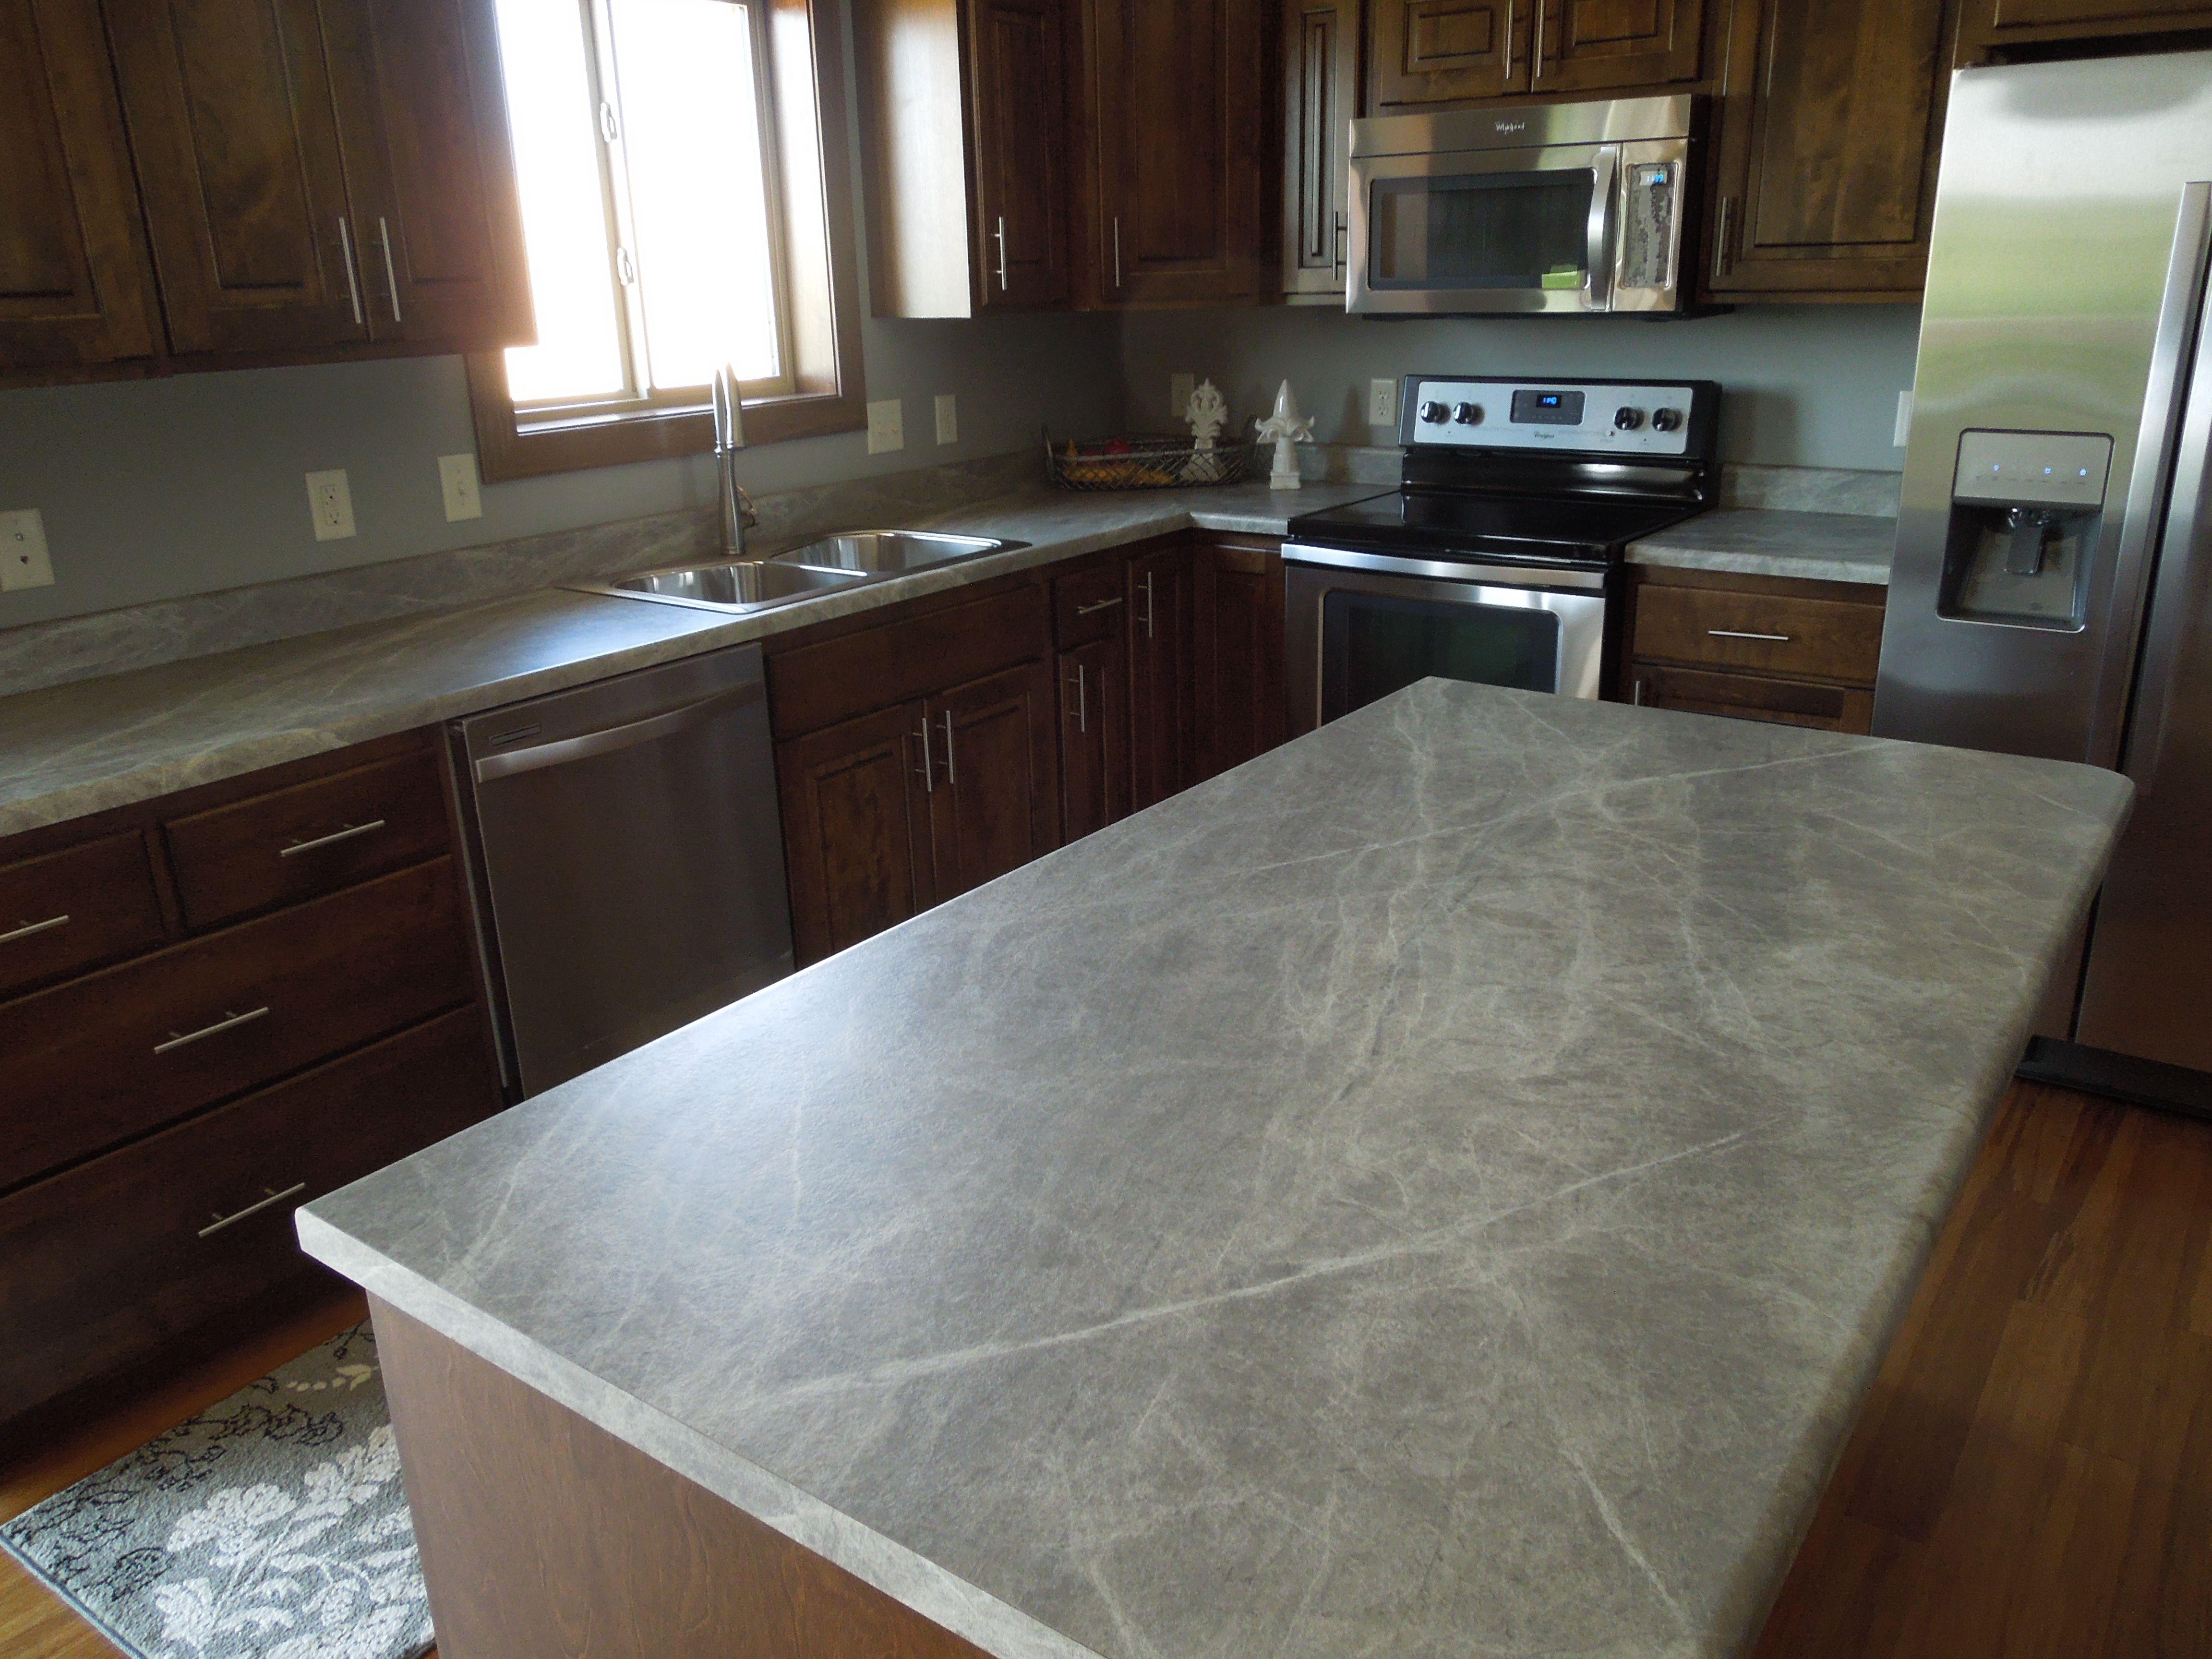 kitchen reno soapstone kitchen countertops Formica fx Soapstone Sequoia kitchen island and perimeter